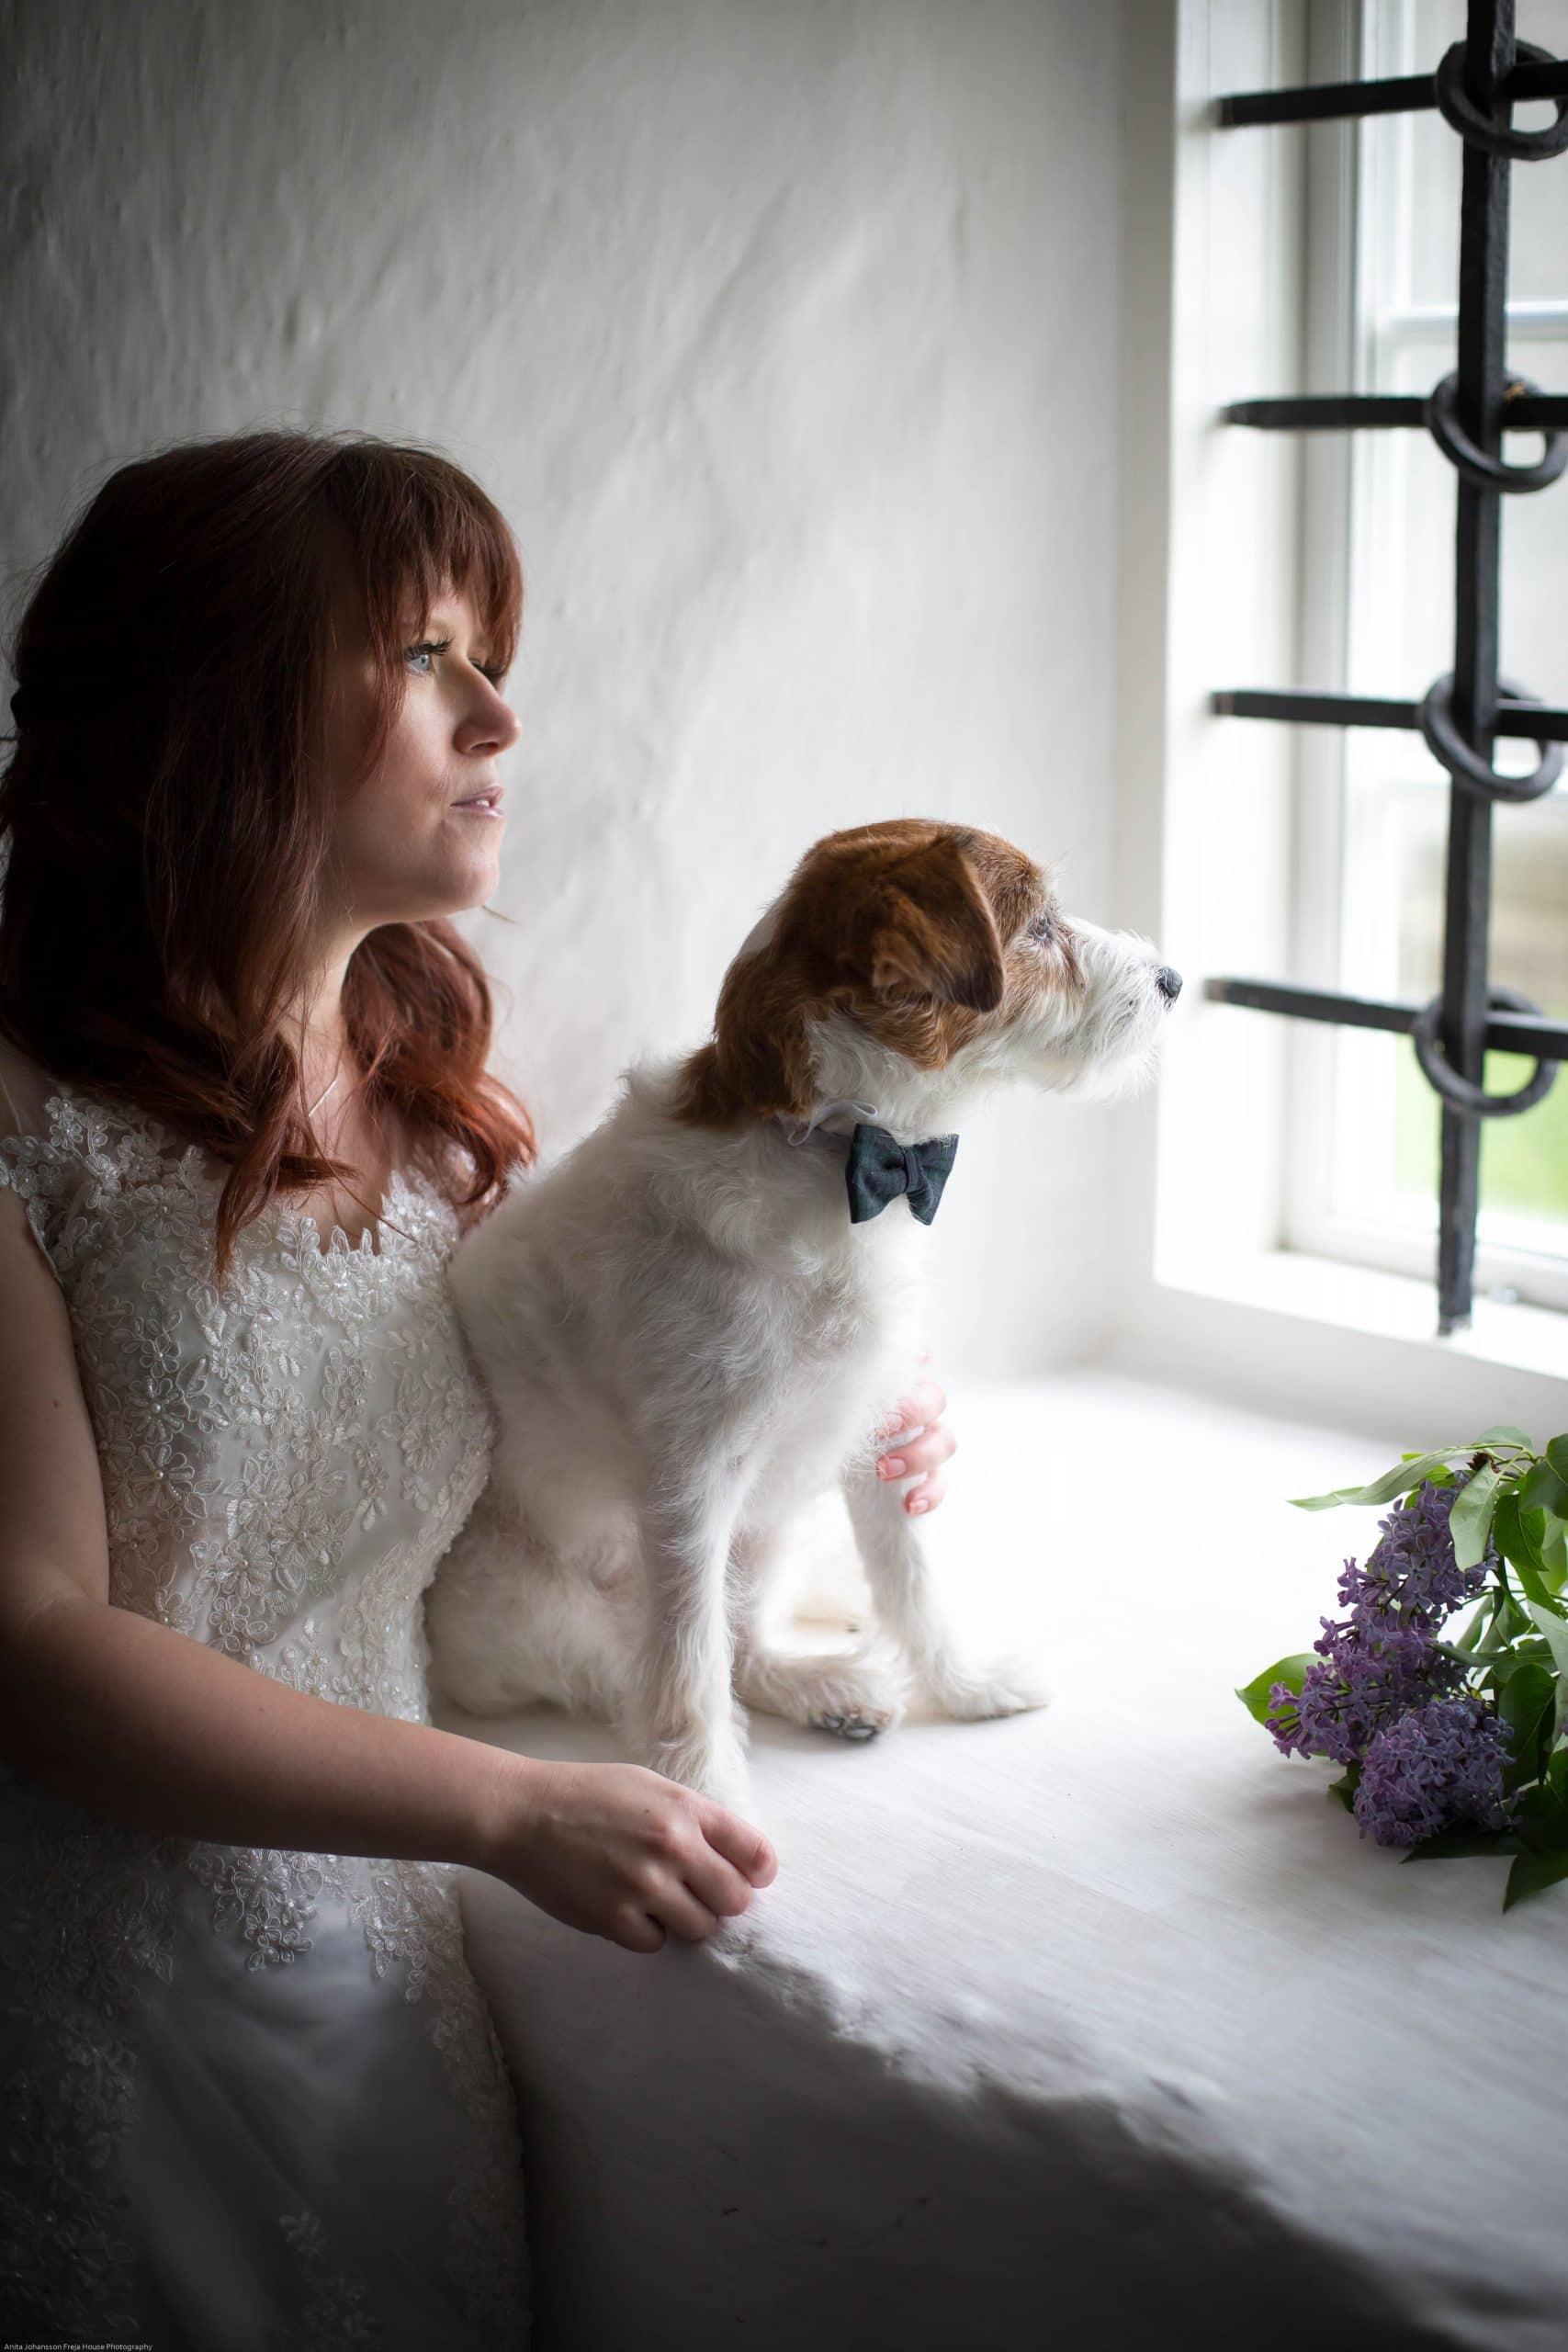 hundfoto russel terrier Frejahousphotography